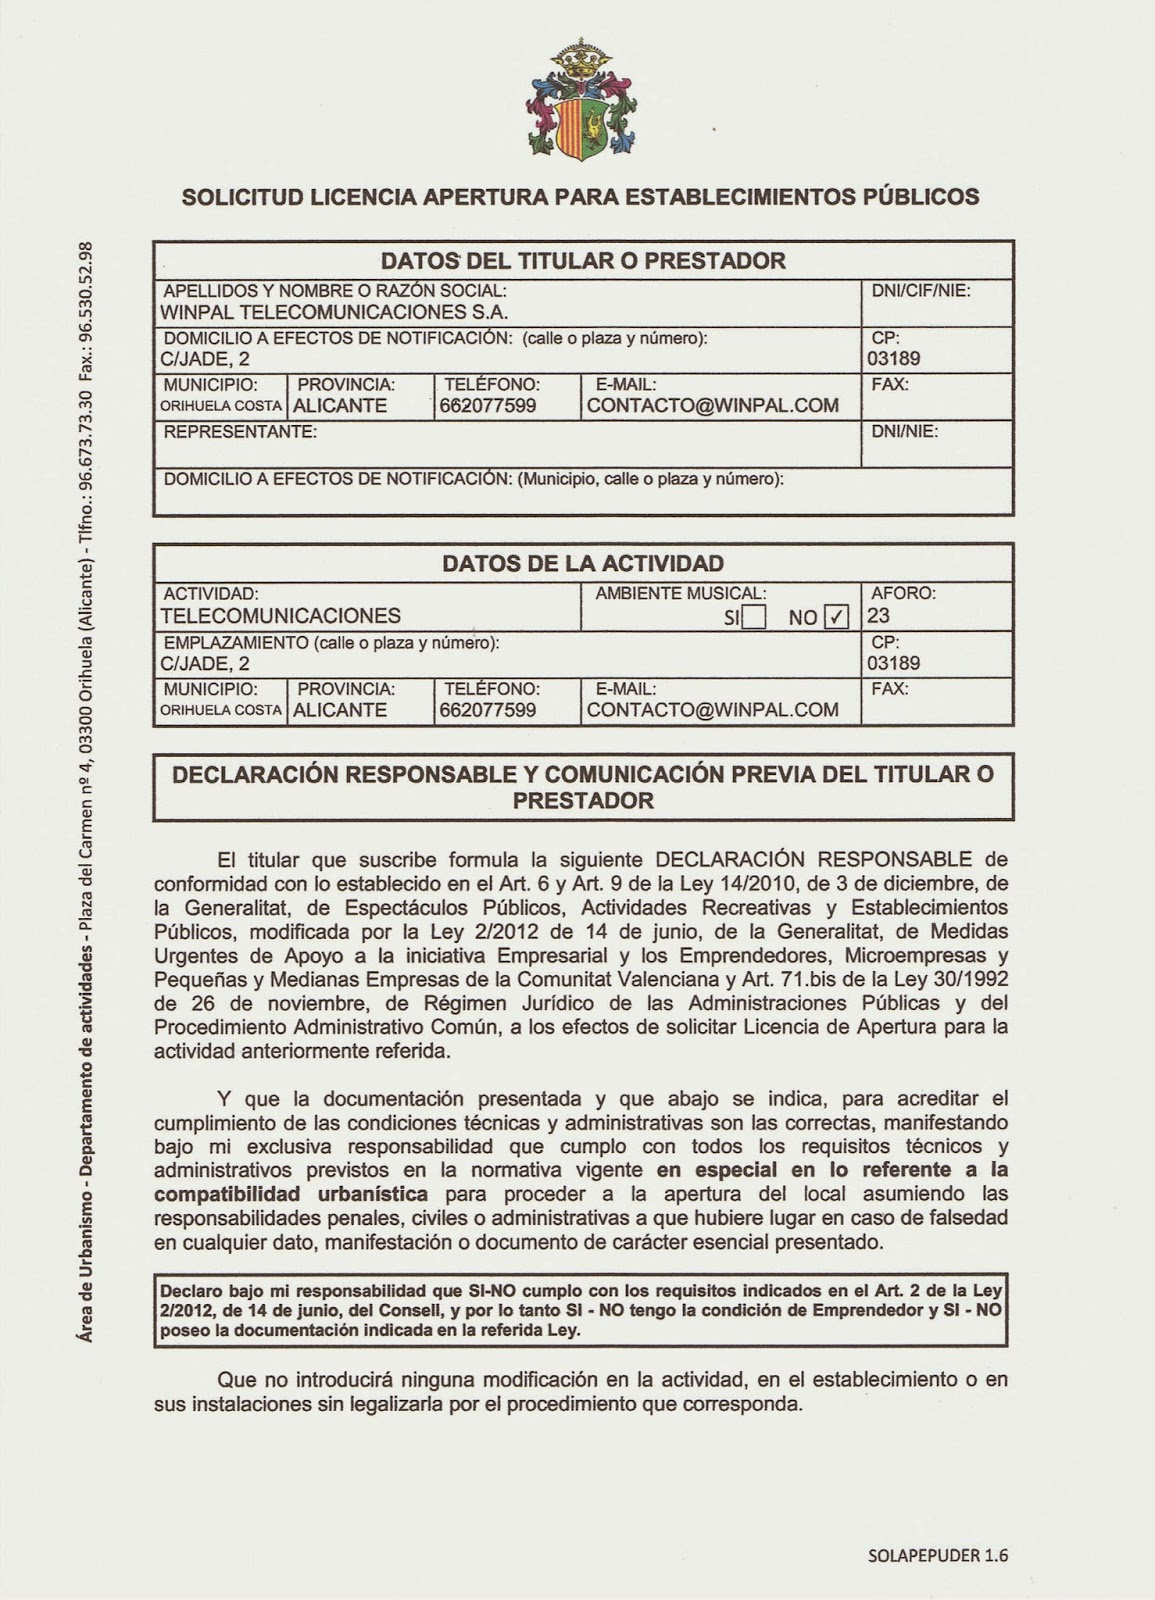 Licencia Apertura Local Madrid. Trendy Licencia De Apertura With .